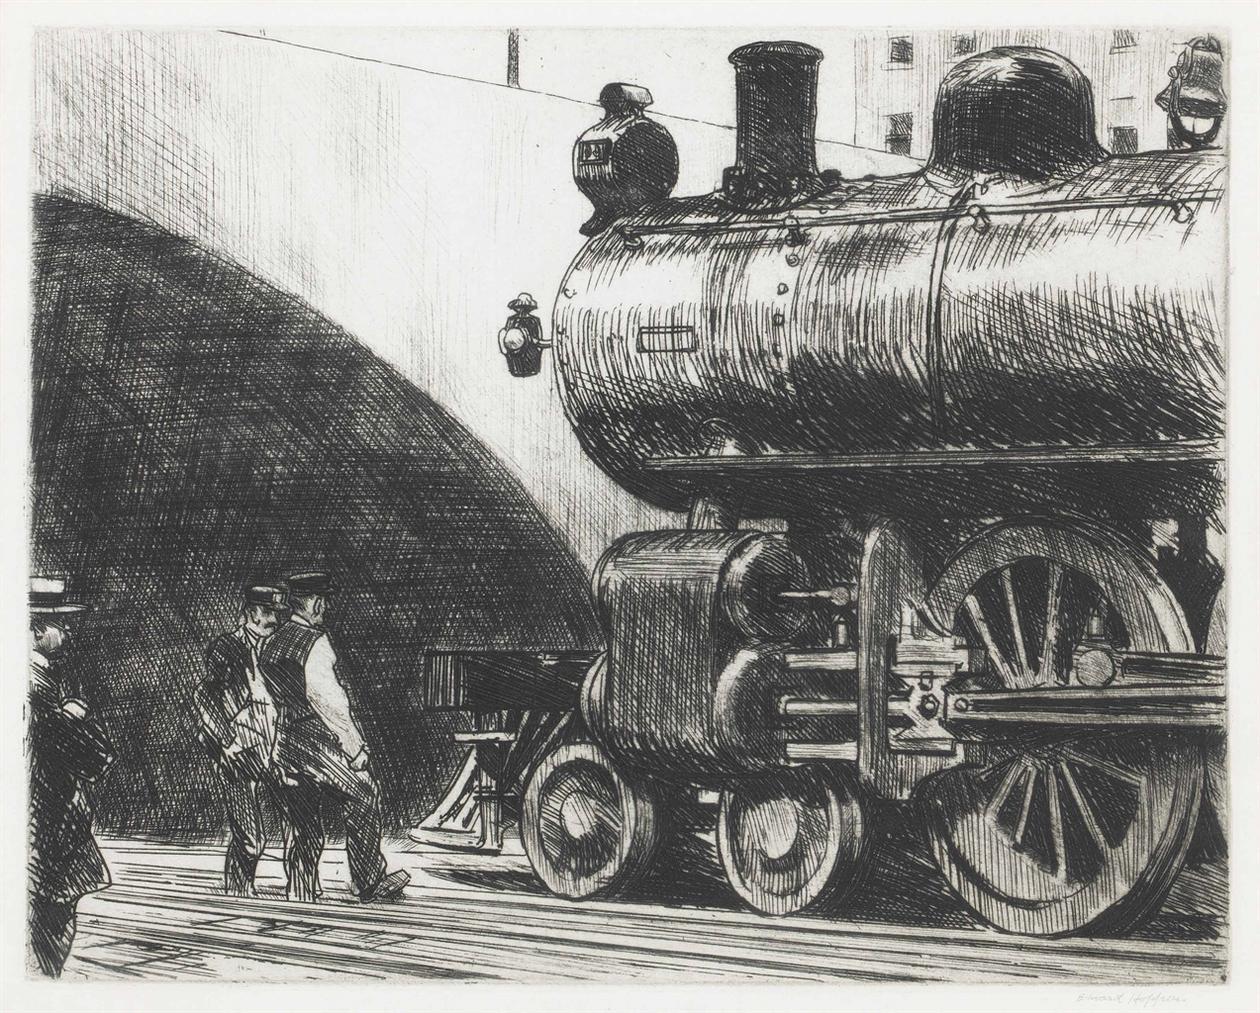 Edward Hopper-The Locomotive-1923